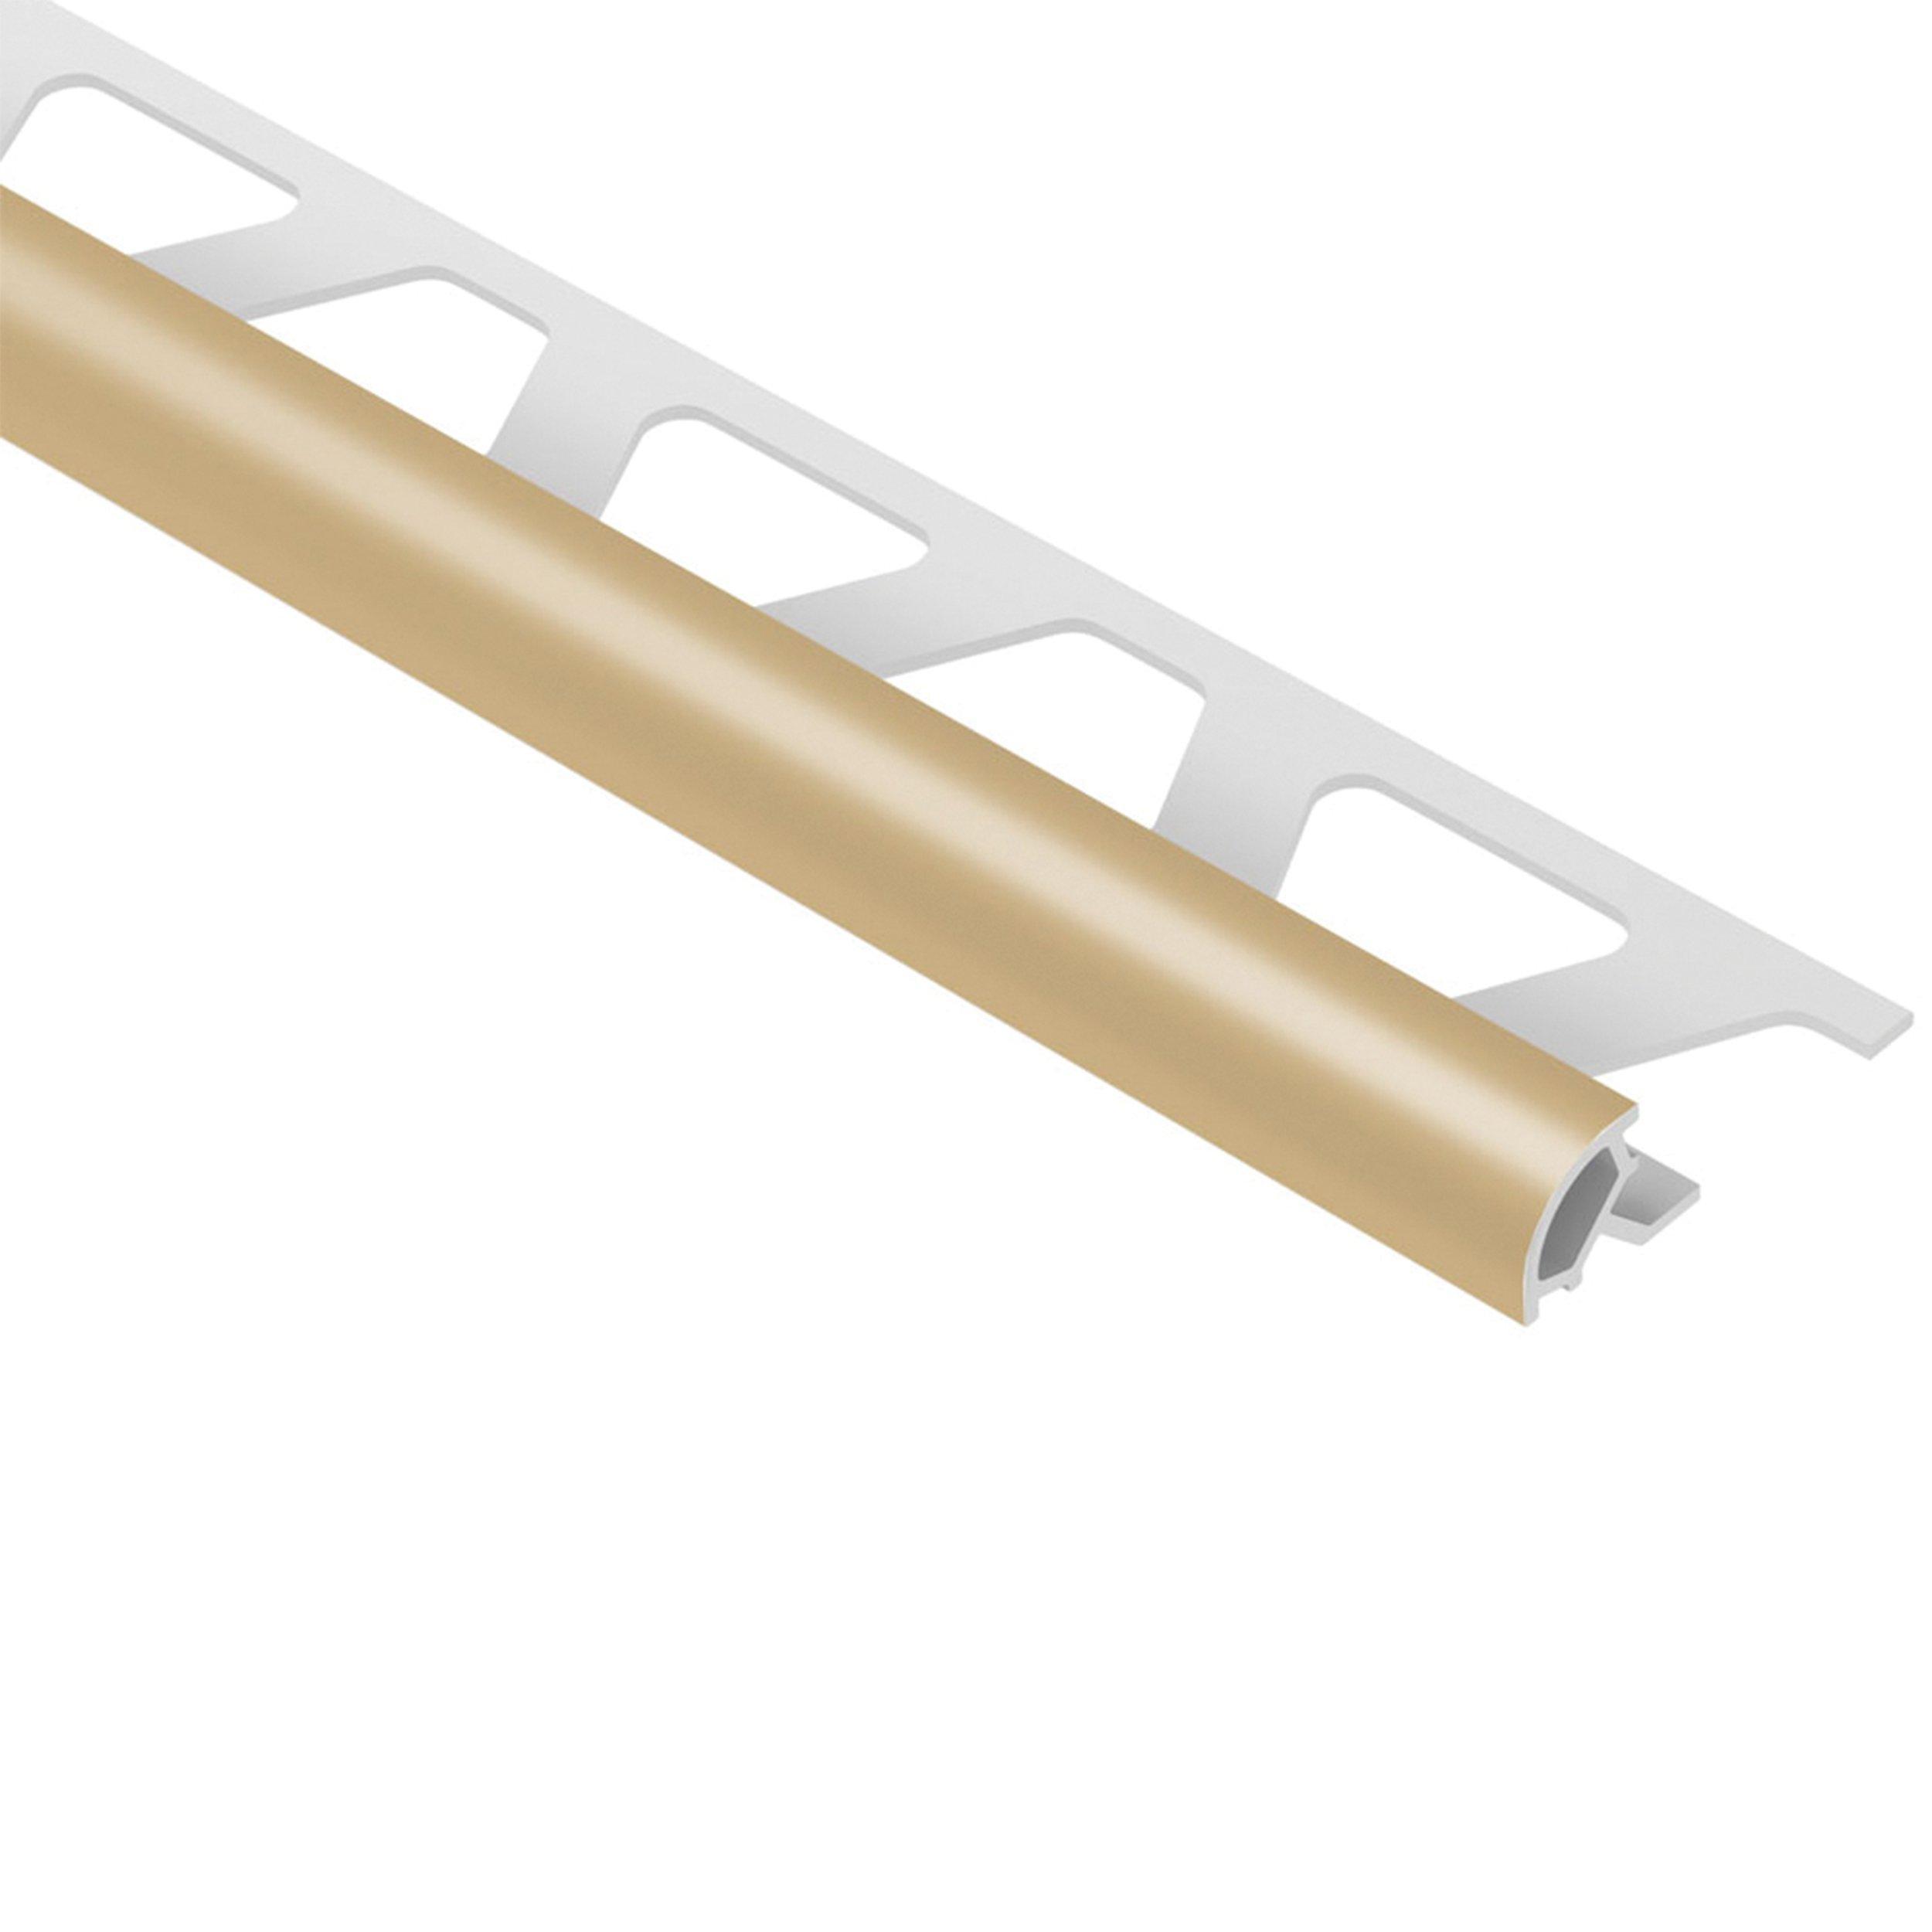 Schluter Rondec Bullnose Trim 1 4in Pvc Light Beige Light Beige Tile Edge Beige